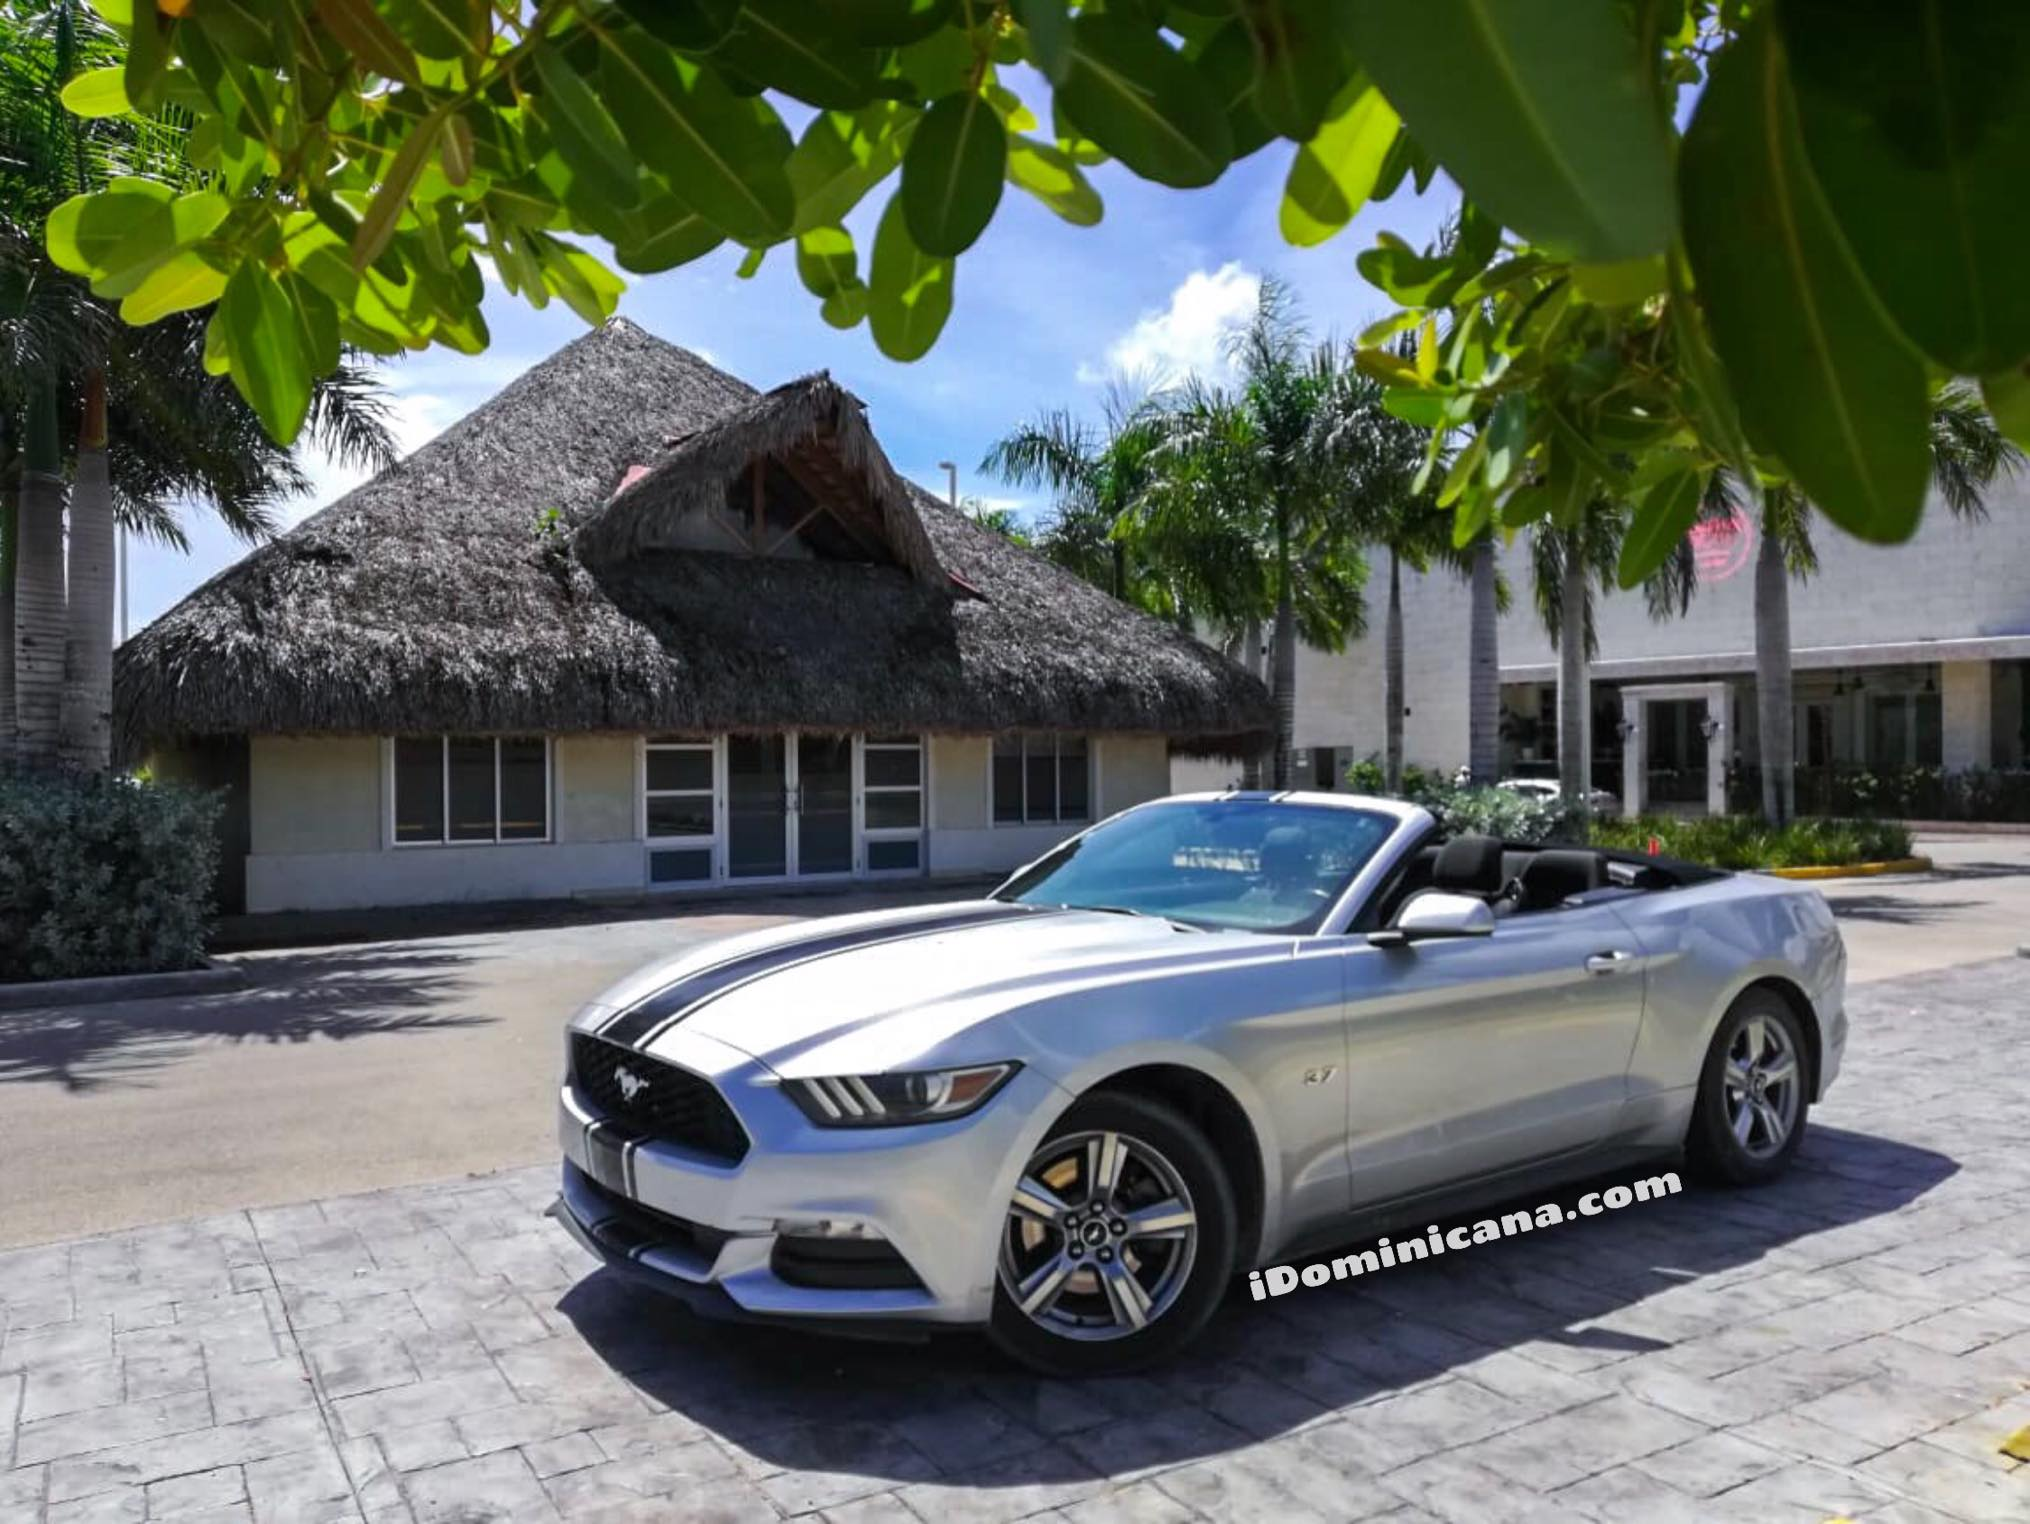 Аренда авто в Доминикане: кабриолет Ford Mustang 2016 iDominicana.com